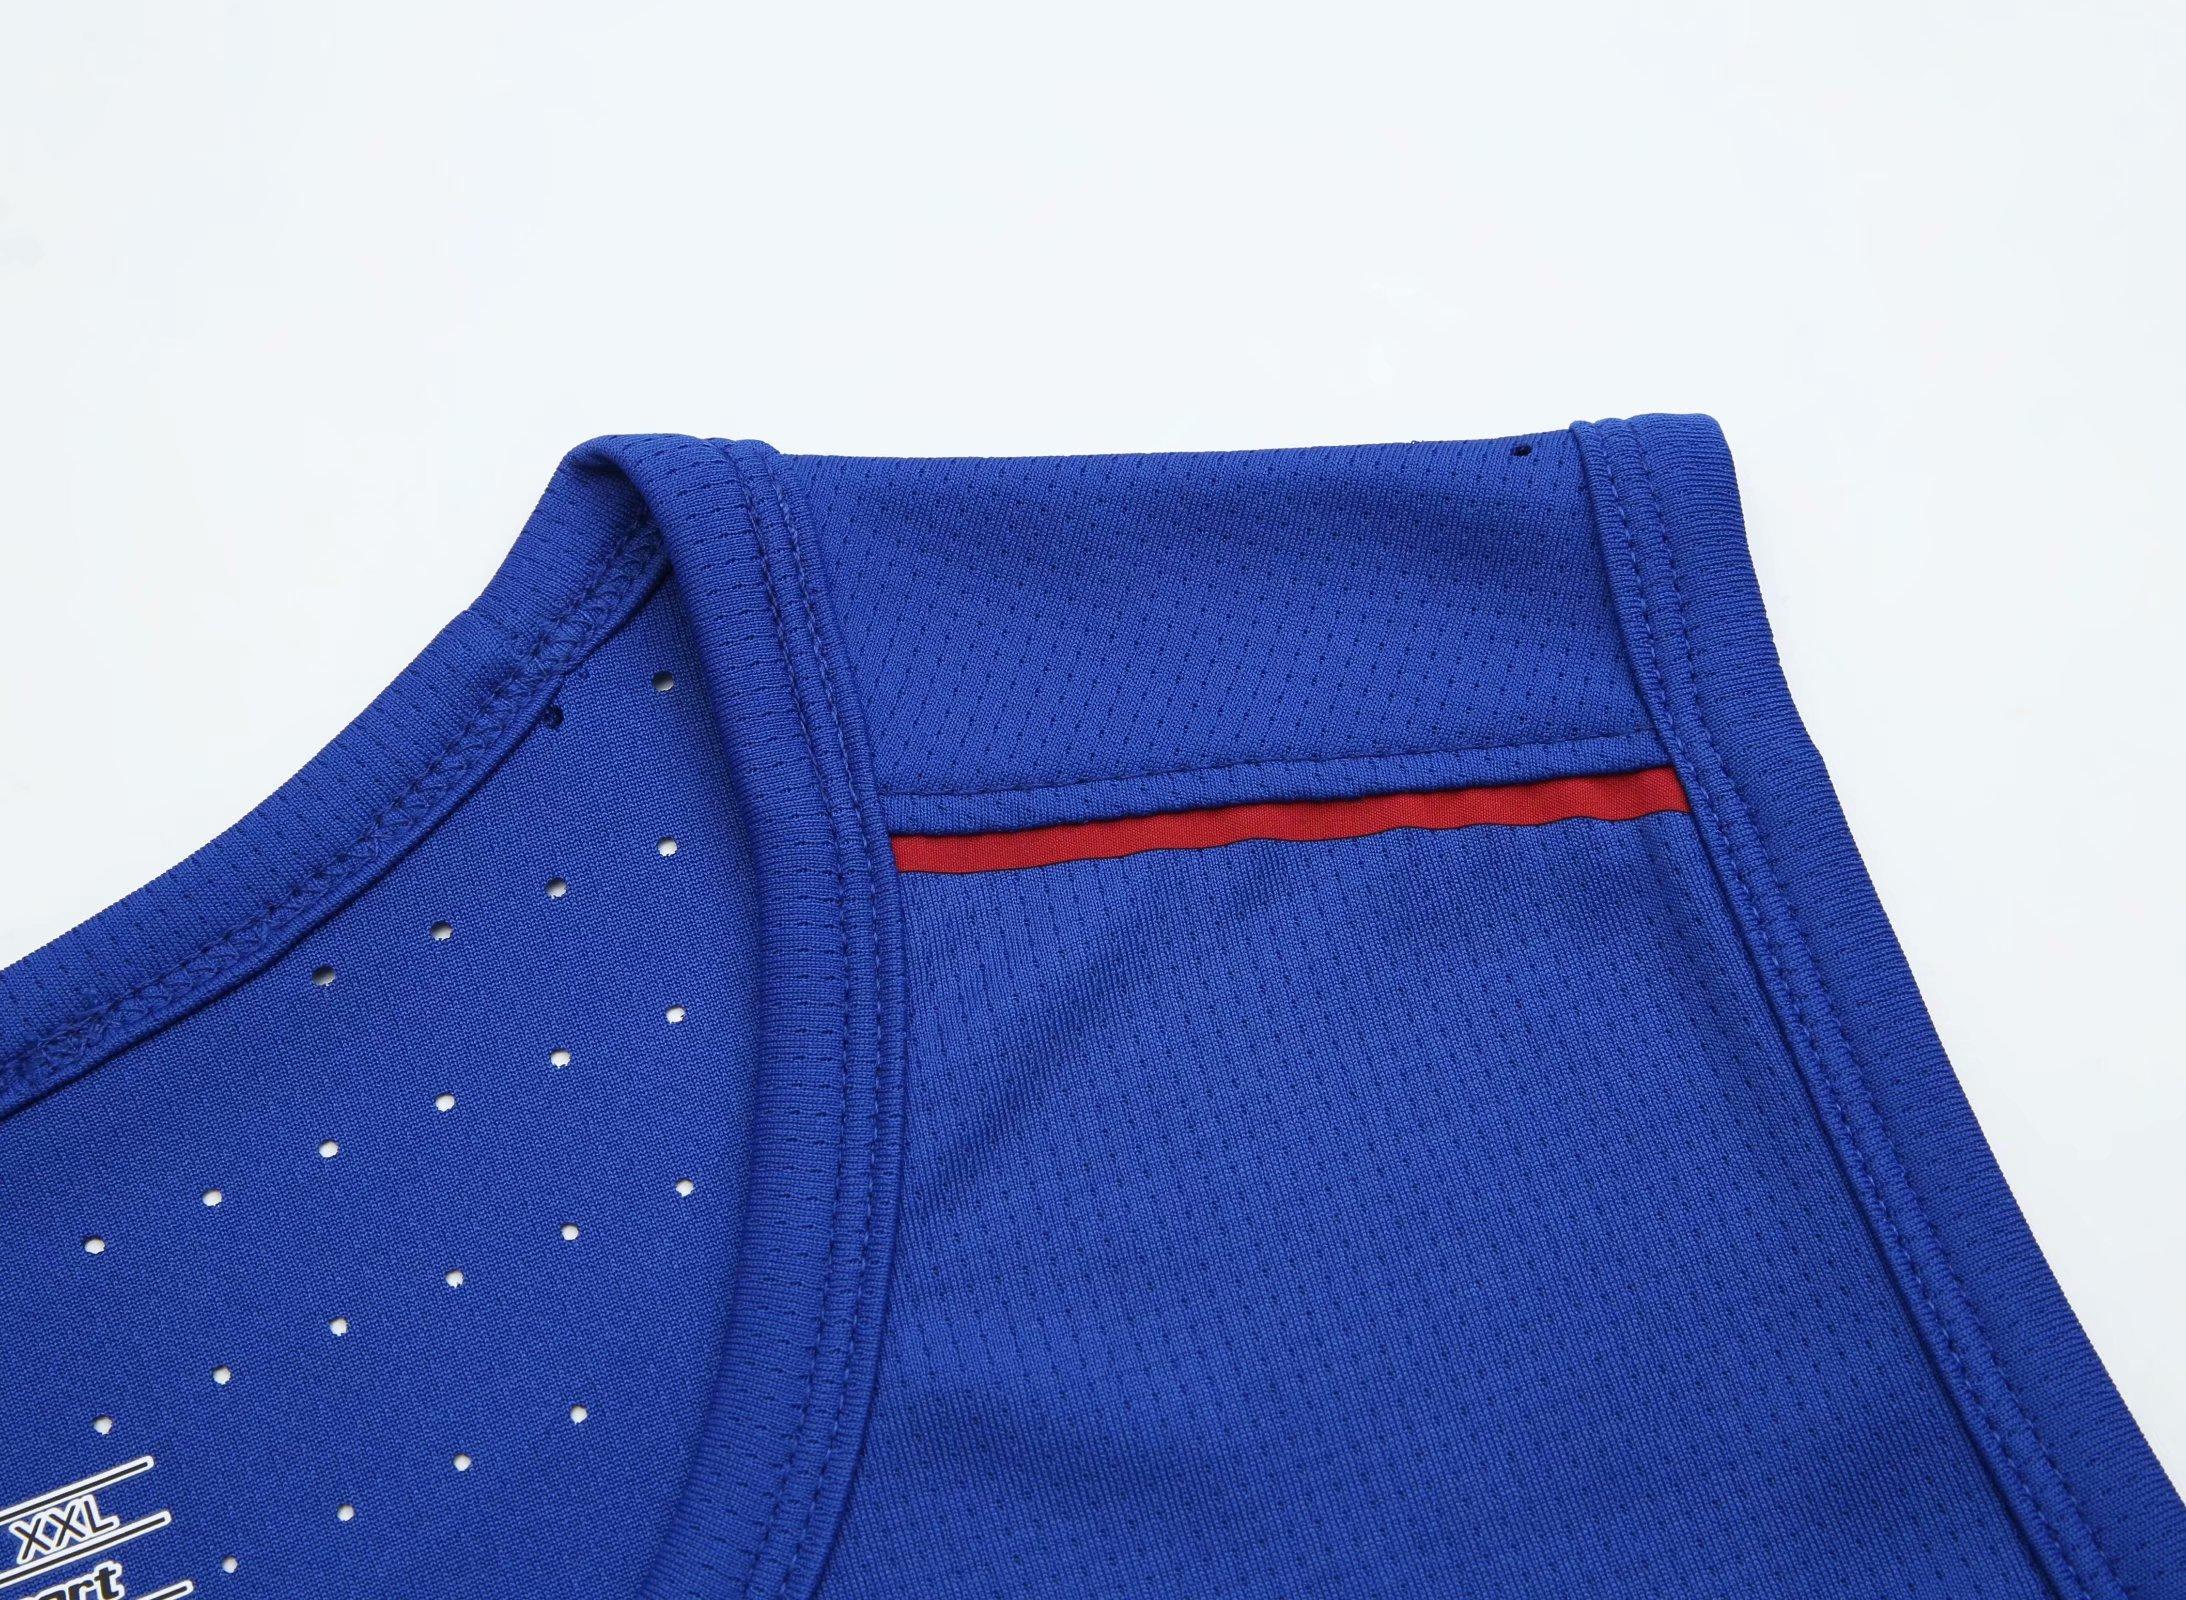 shorts design pessoal disponível basquete jérsei adulto